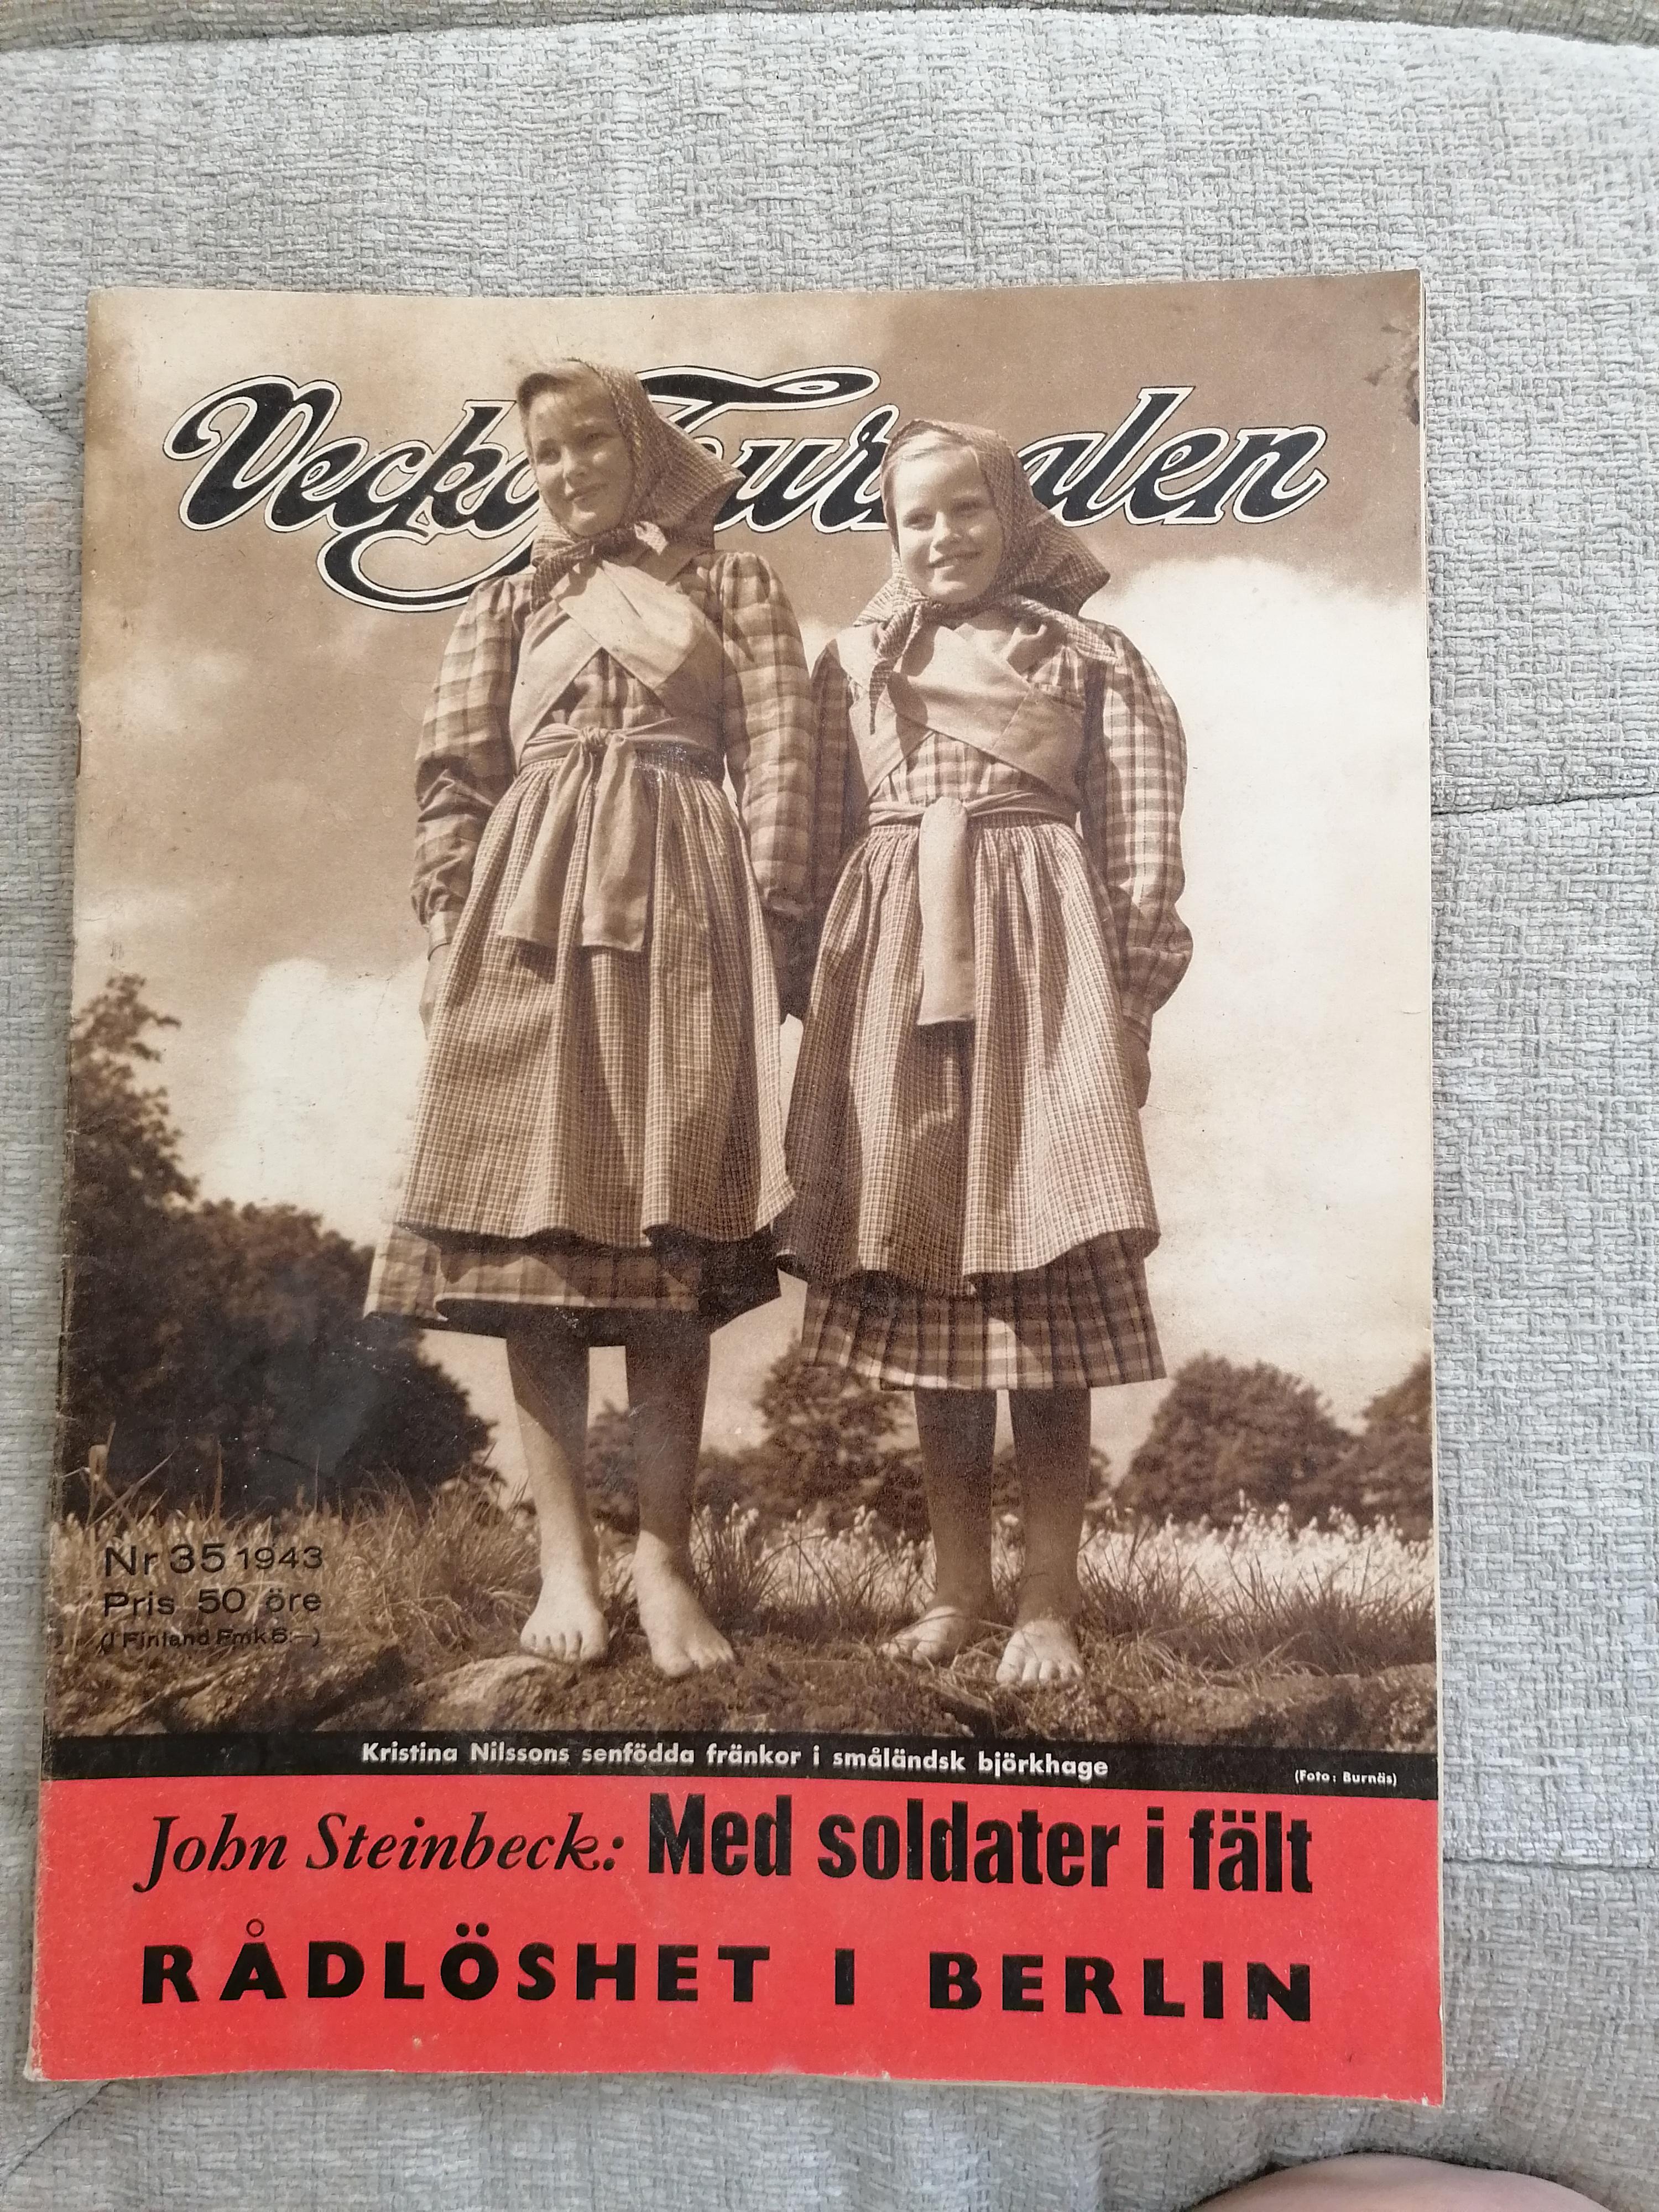 Veckojournalen Nr 35 1943